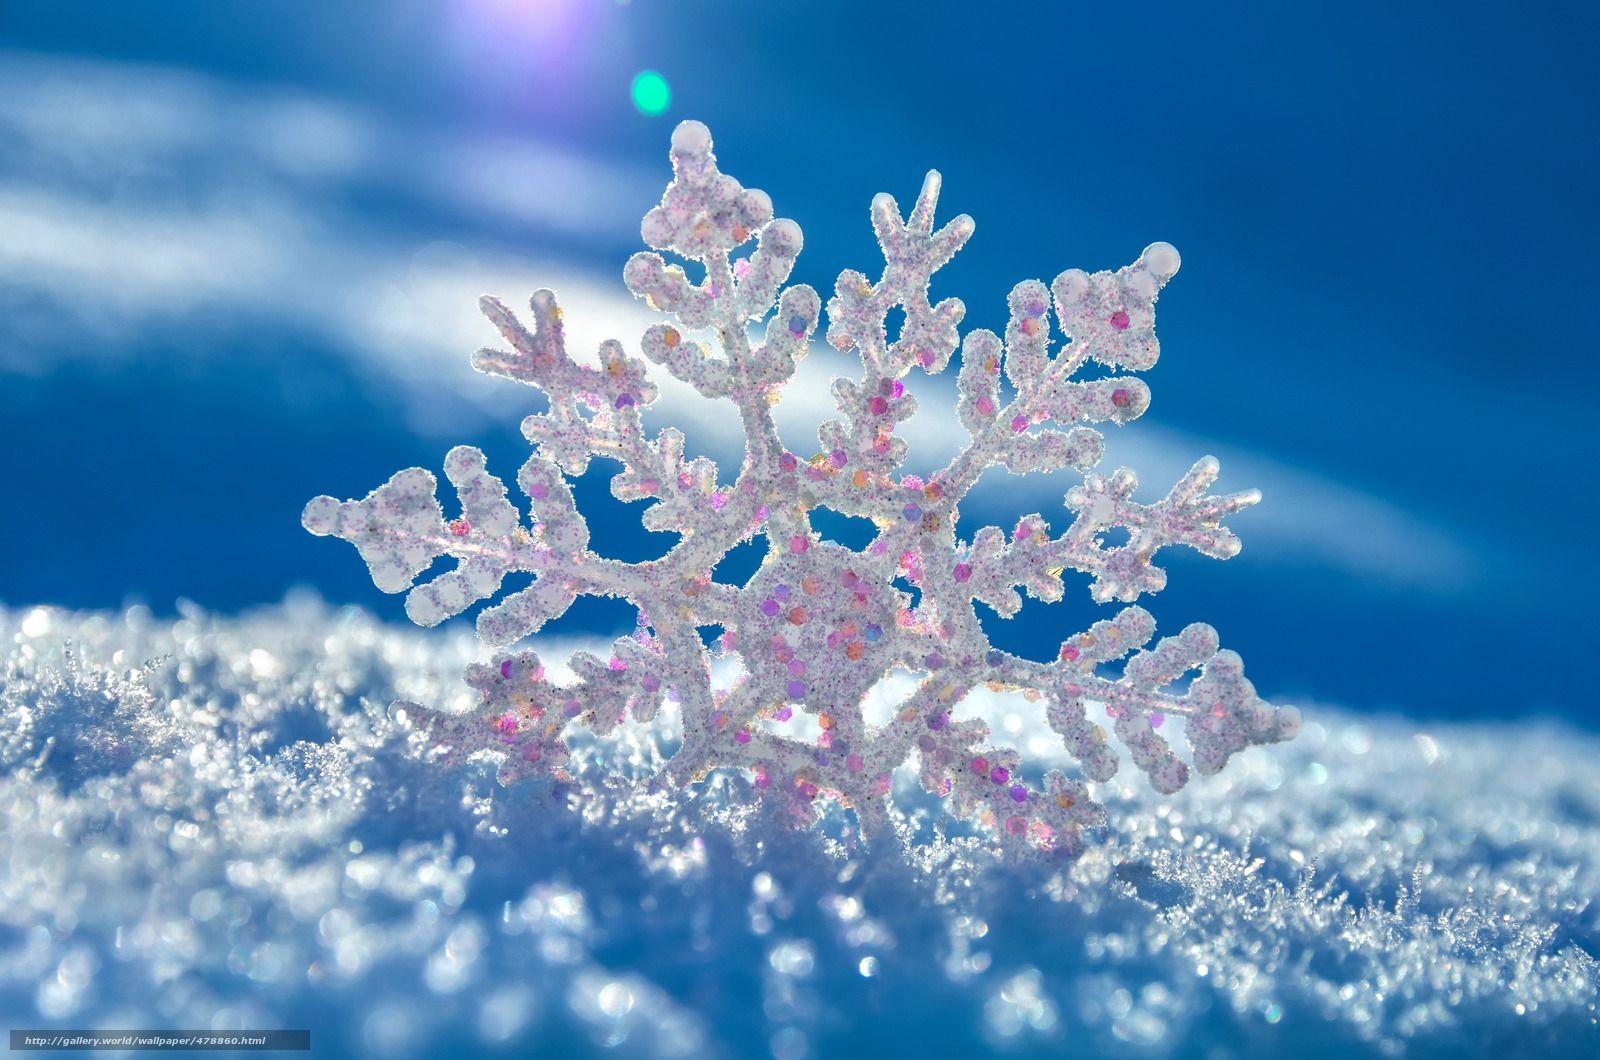 Scaricare Gli Sfondi Fiocco Di Neve Neve Vkrapinki Sfondi